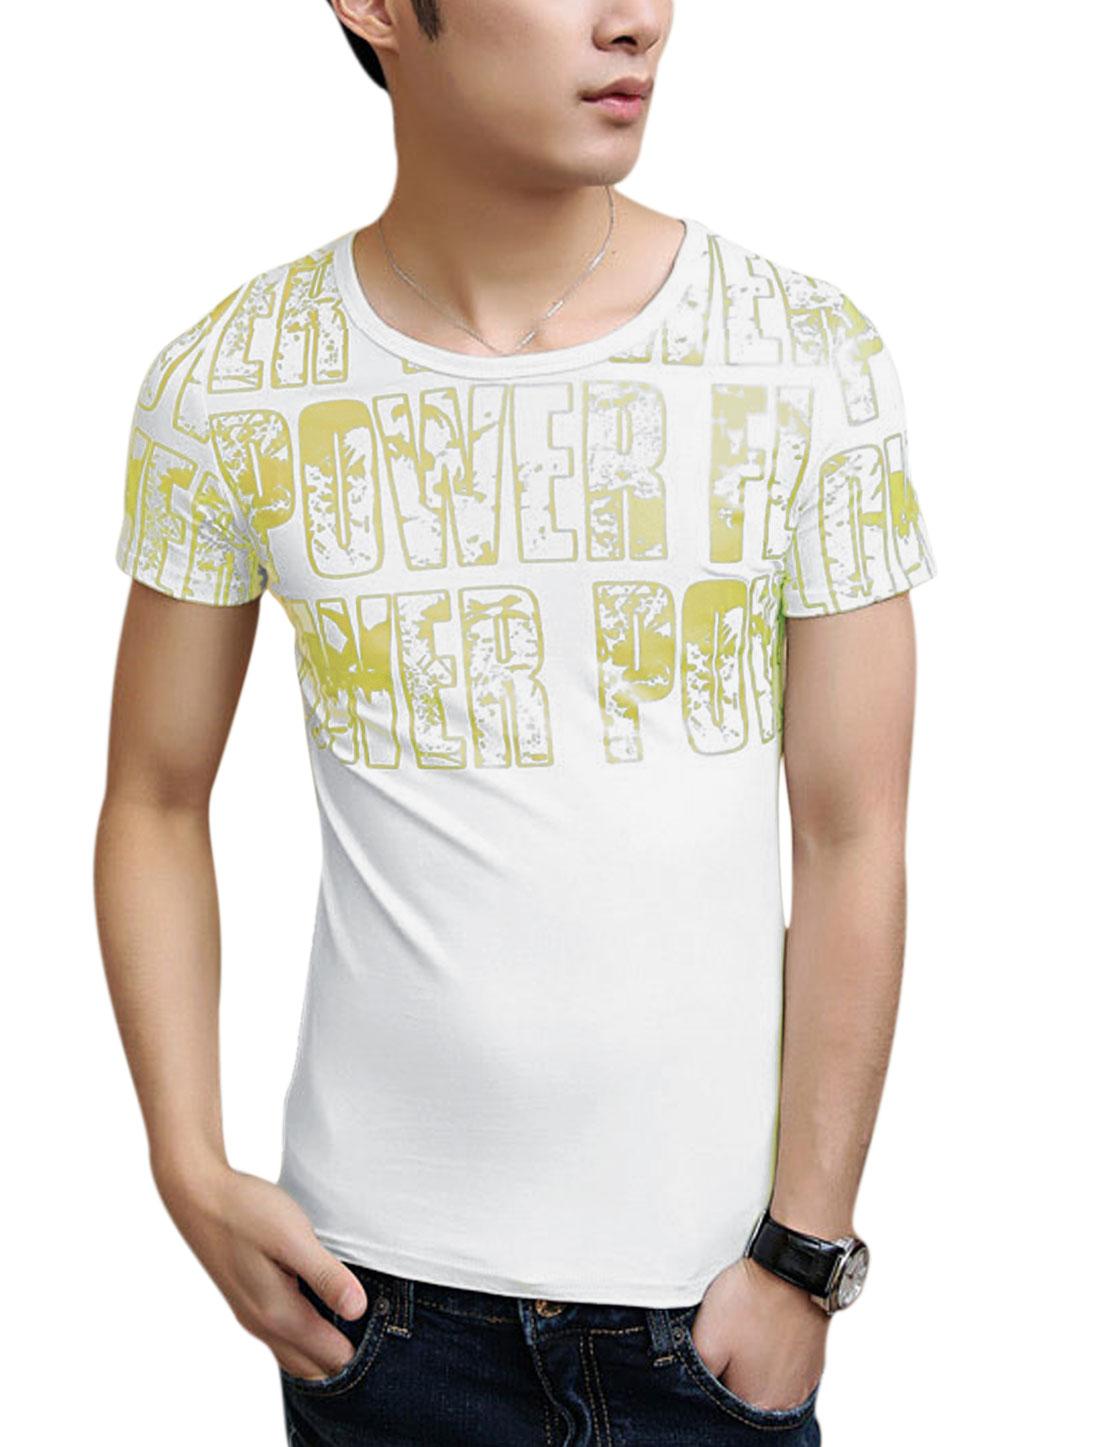 Men Slim Fit Short Sleeve Letters Prints Casual T-Shirt White S